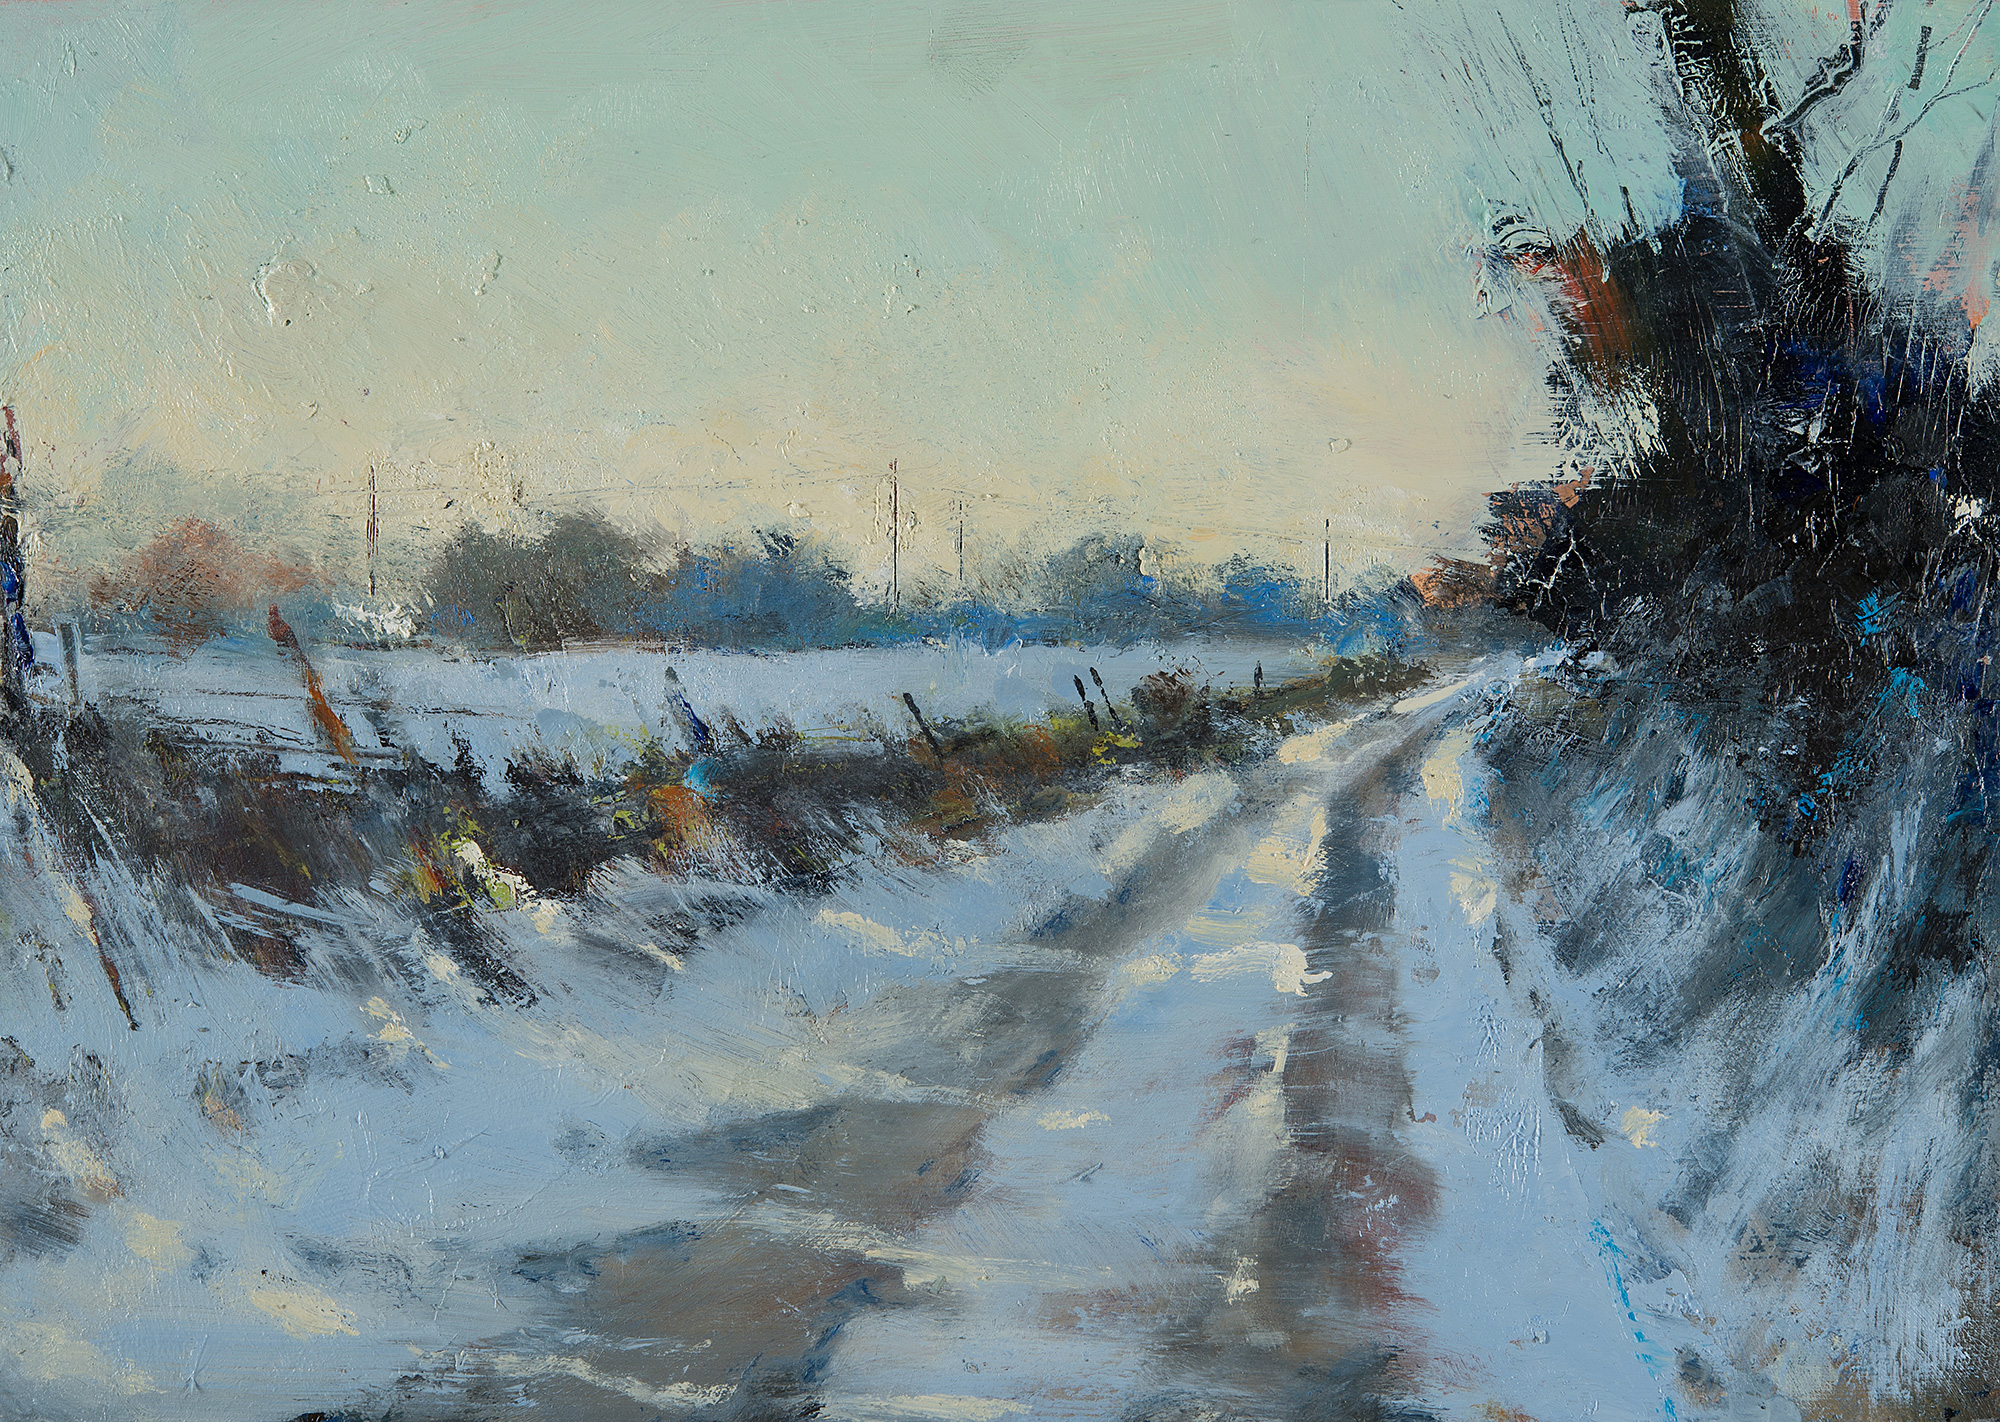 Evening Walk,Soft Snow.  Oil on board.22 x 31cm  Sold